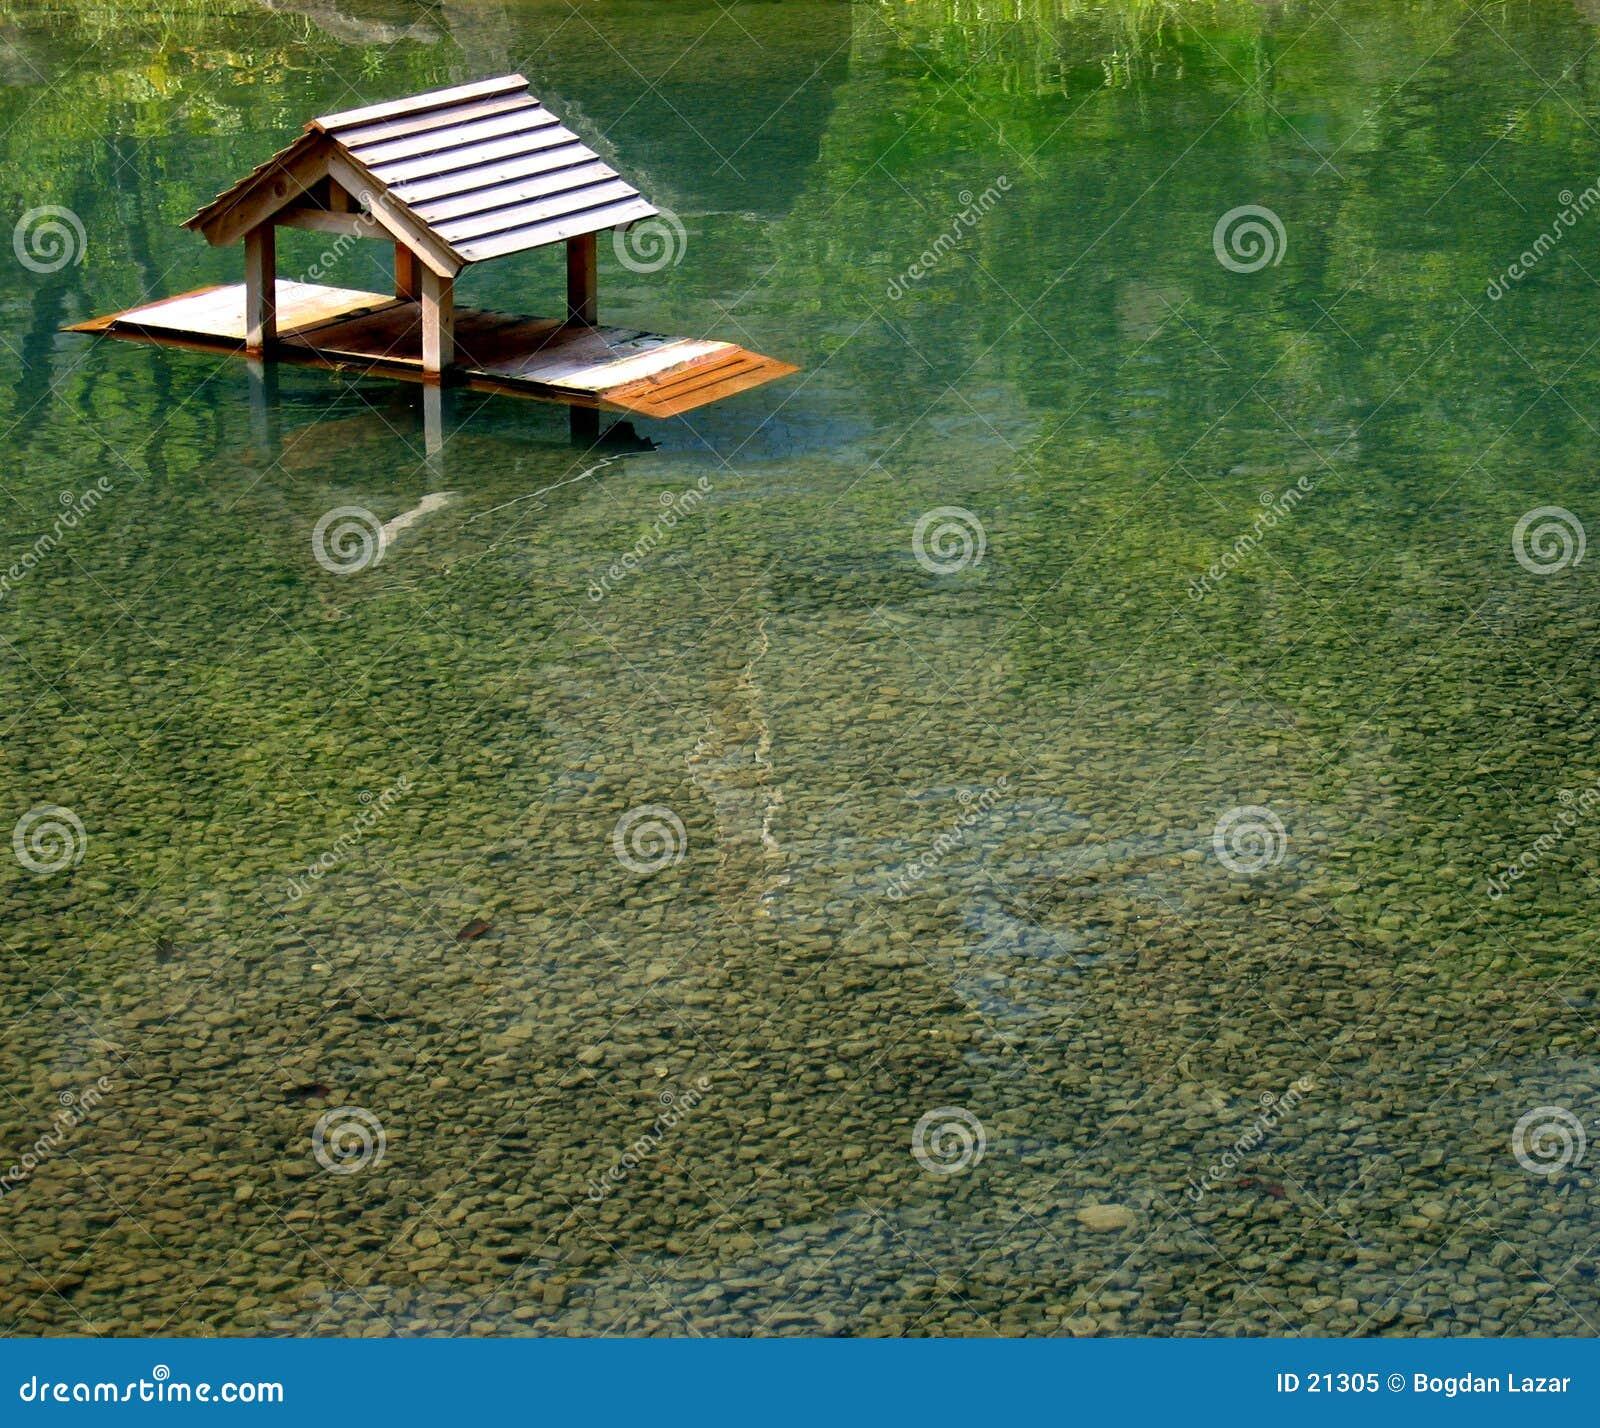 Floating shrine